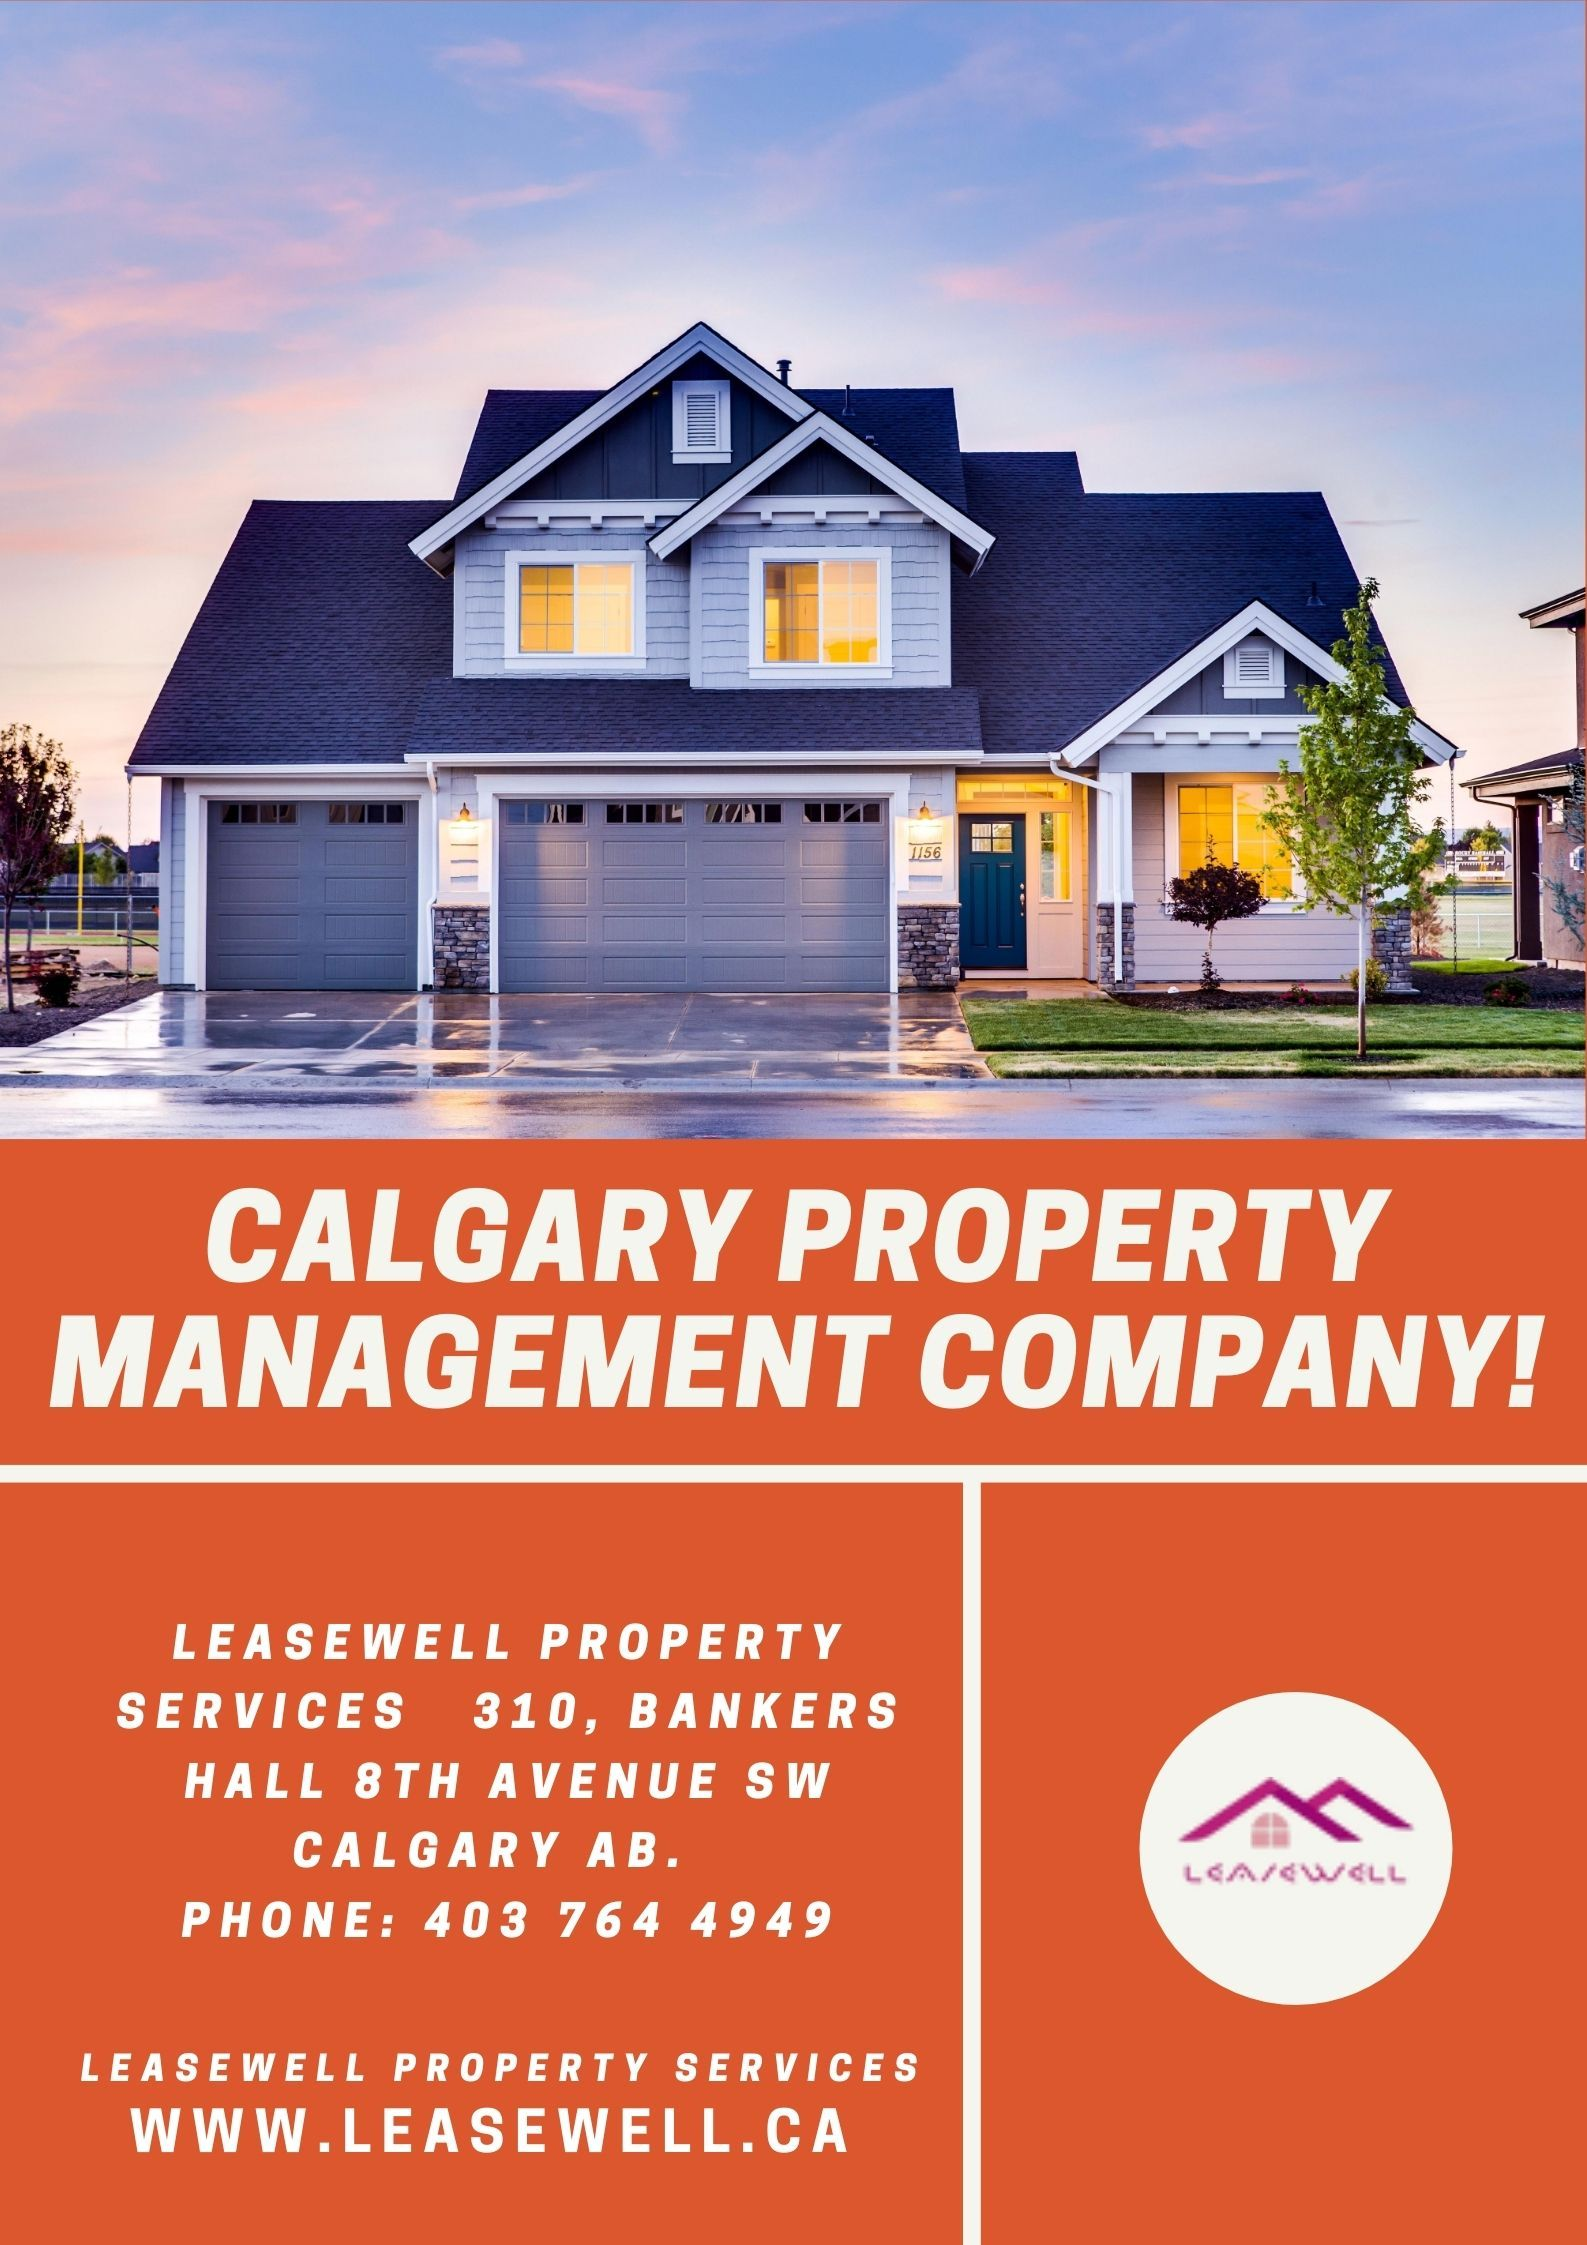 Calgary Property Management Company Property Management Rental Property Management Property Marketing